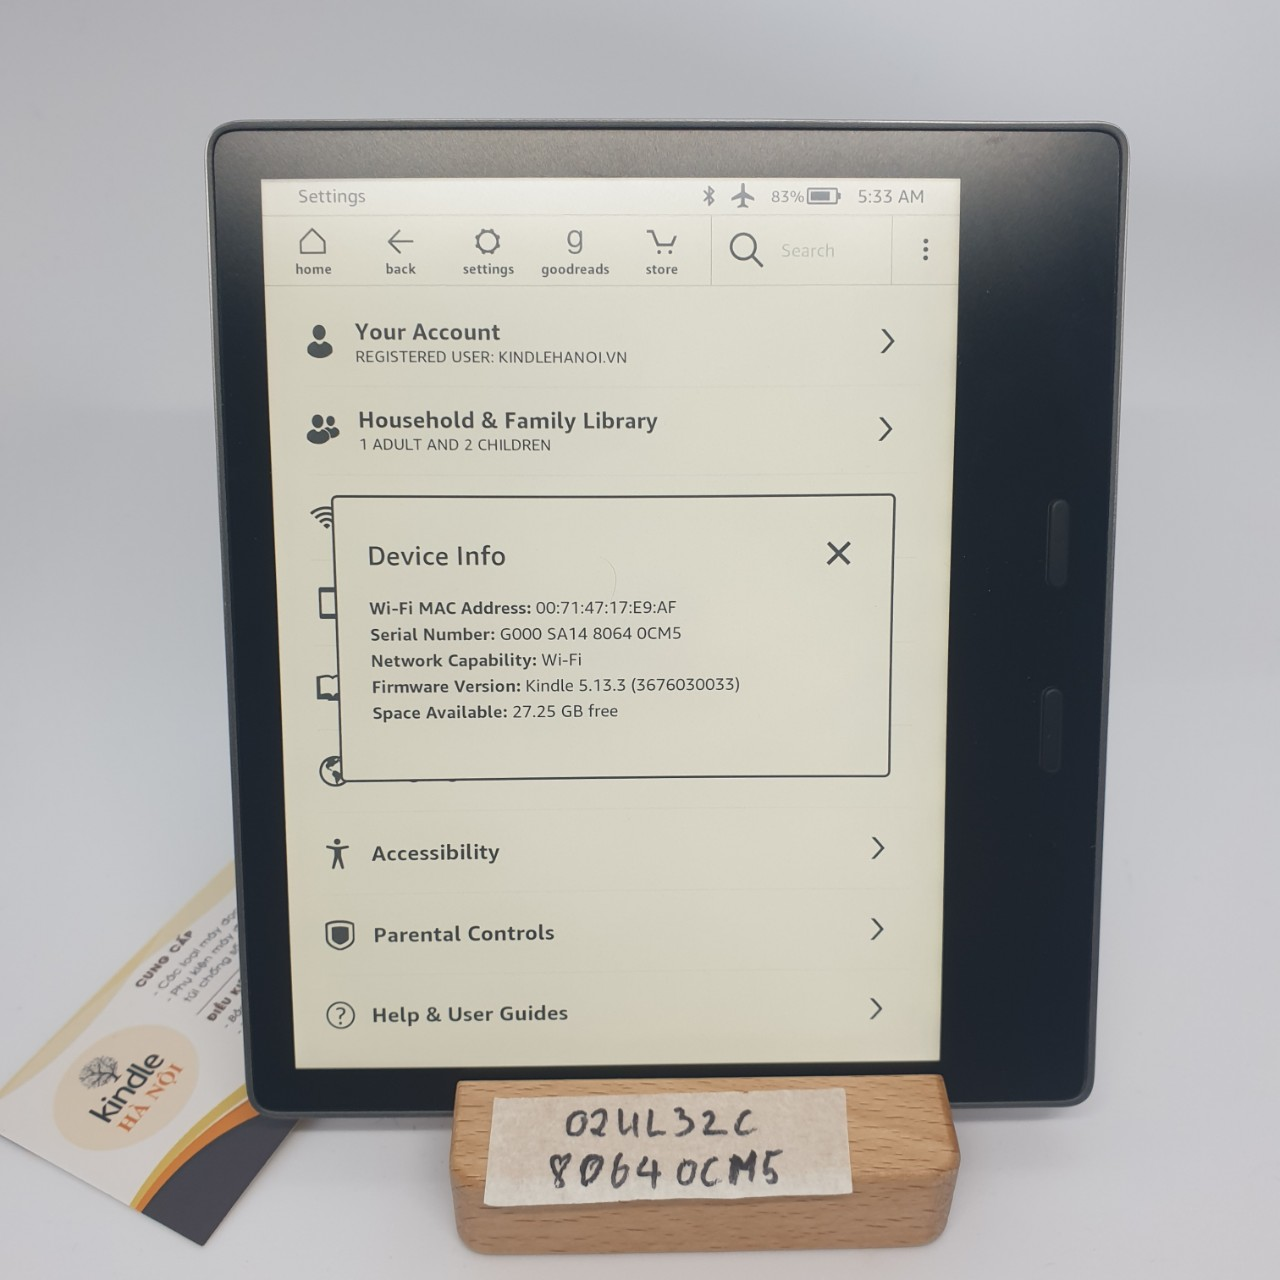 Used Very Good | Máy đọc sách Kindle Oasis 2 (9th) O2 bản 32GB (CODE 0CM5)